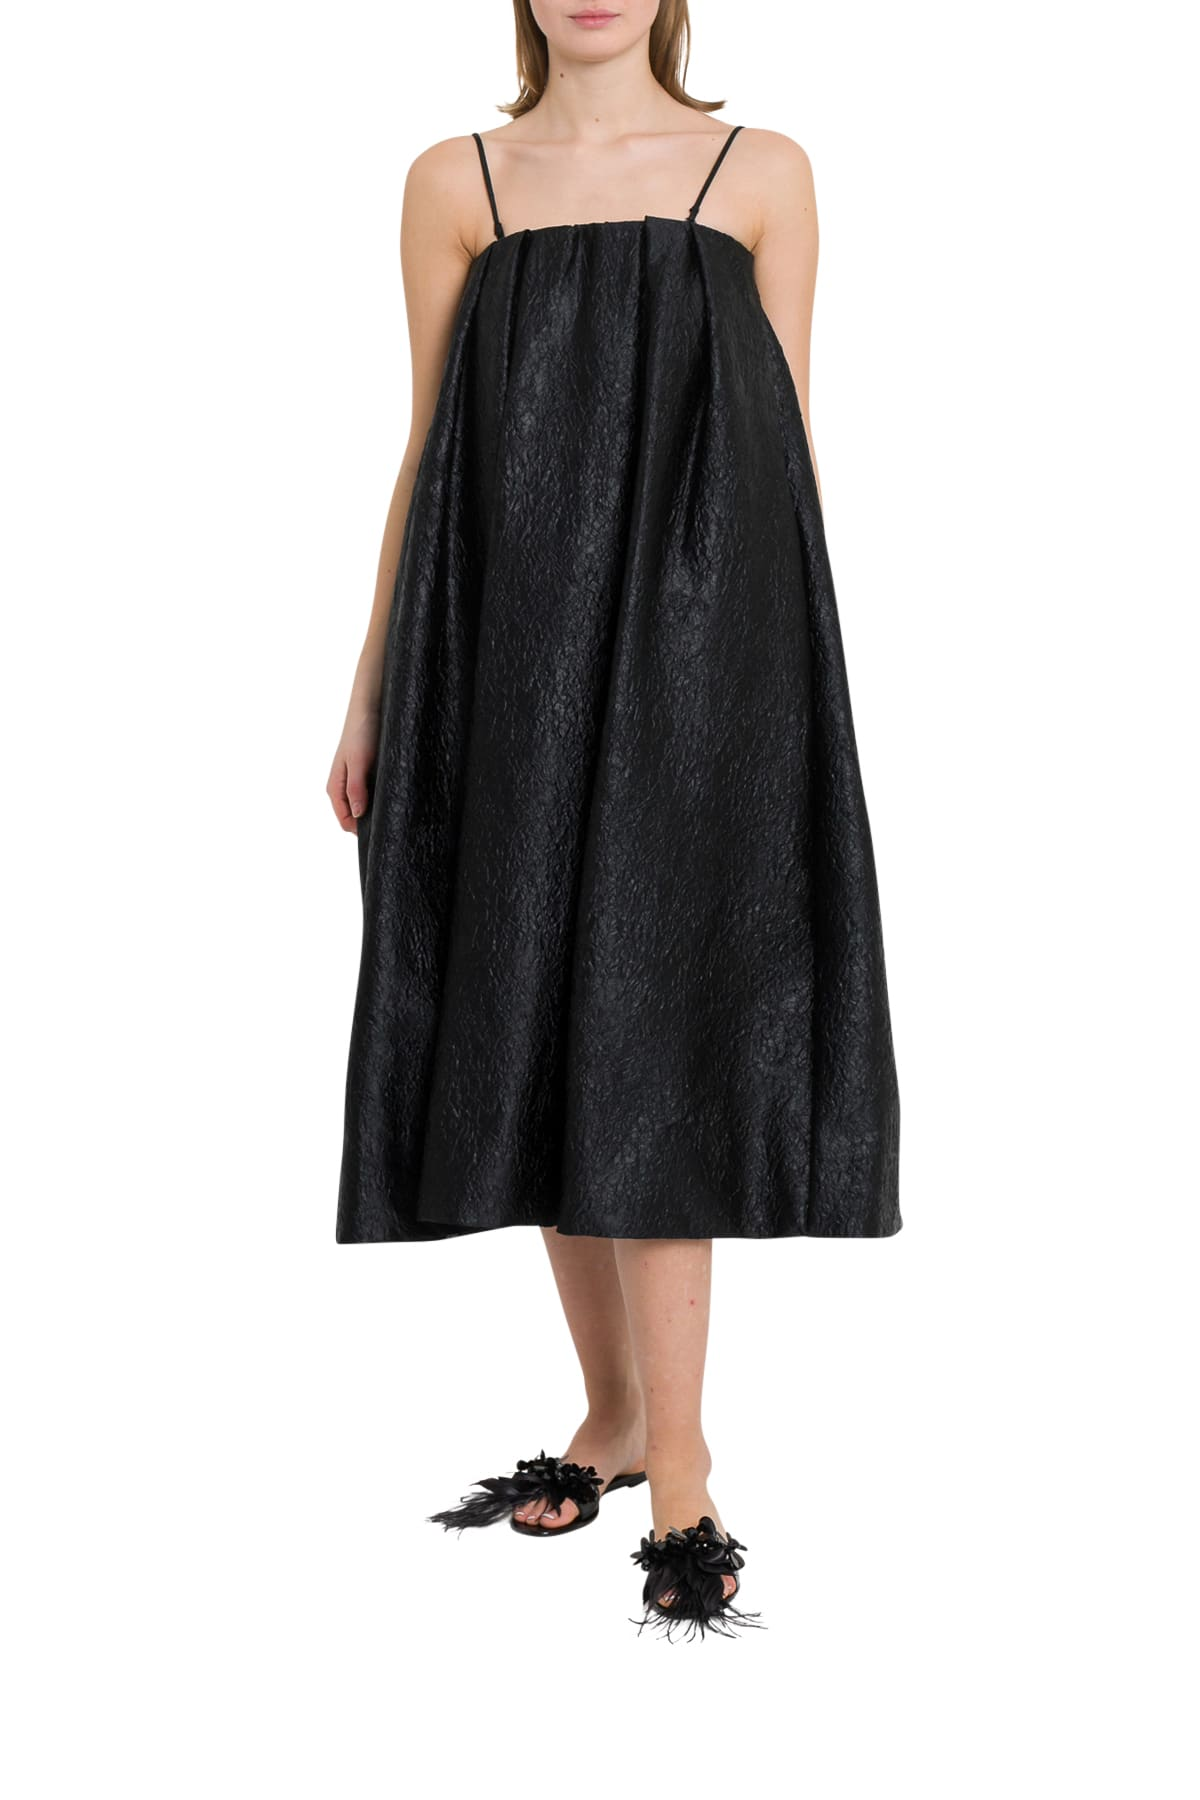 Simone Rocha A-line Dress In Brocade Fabric